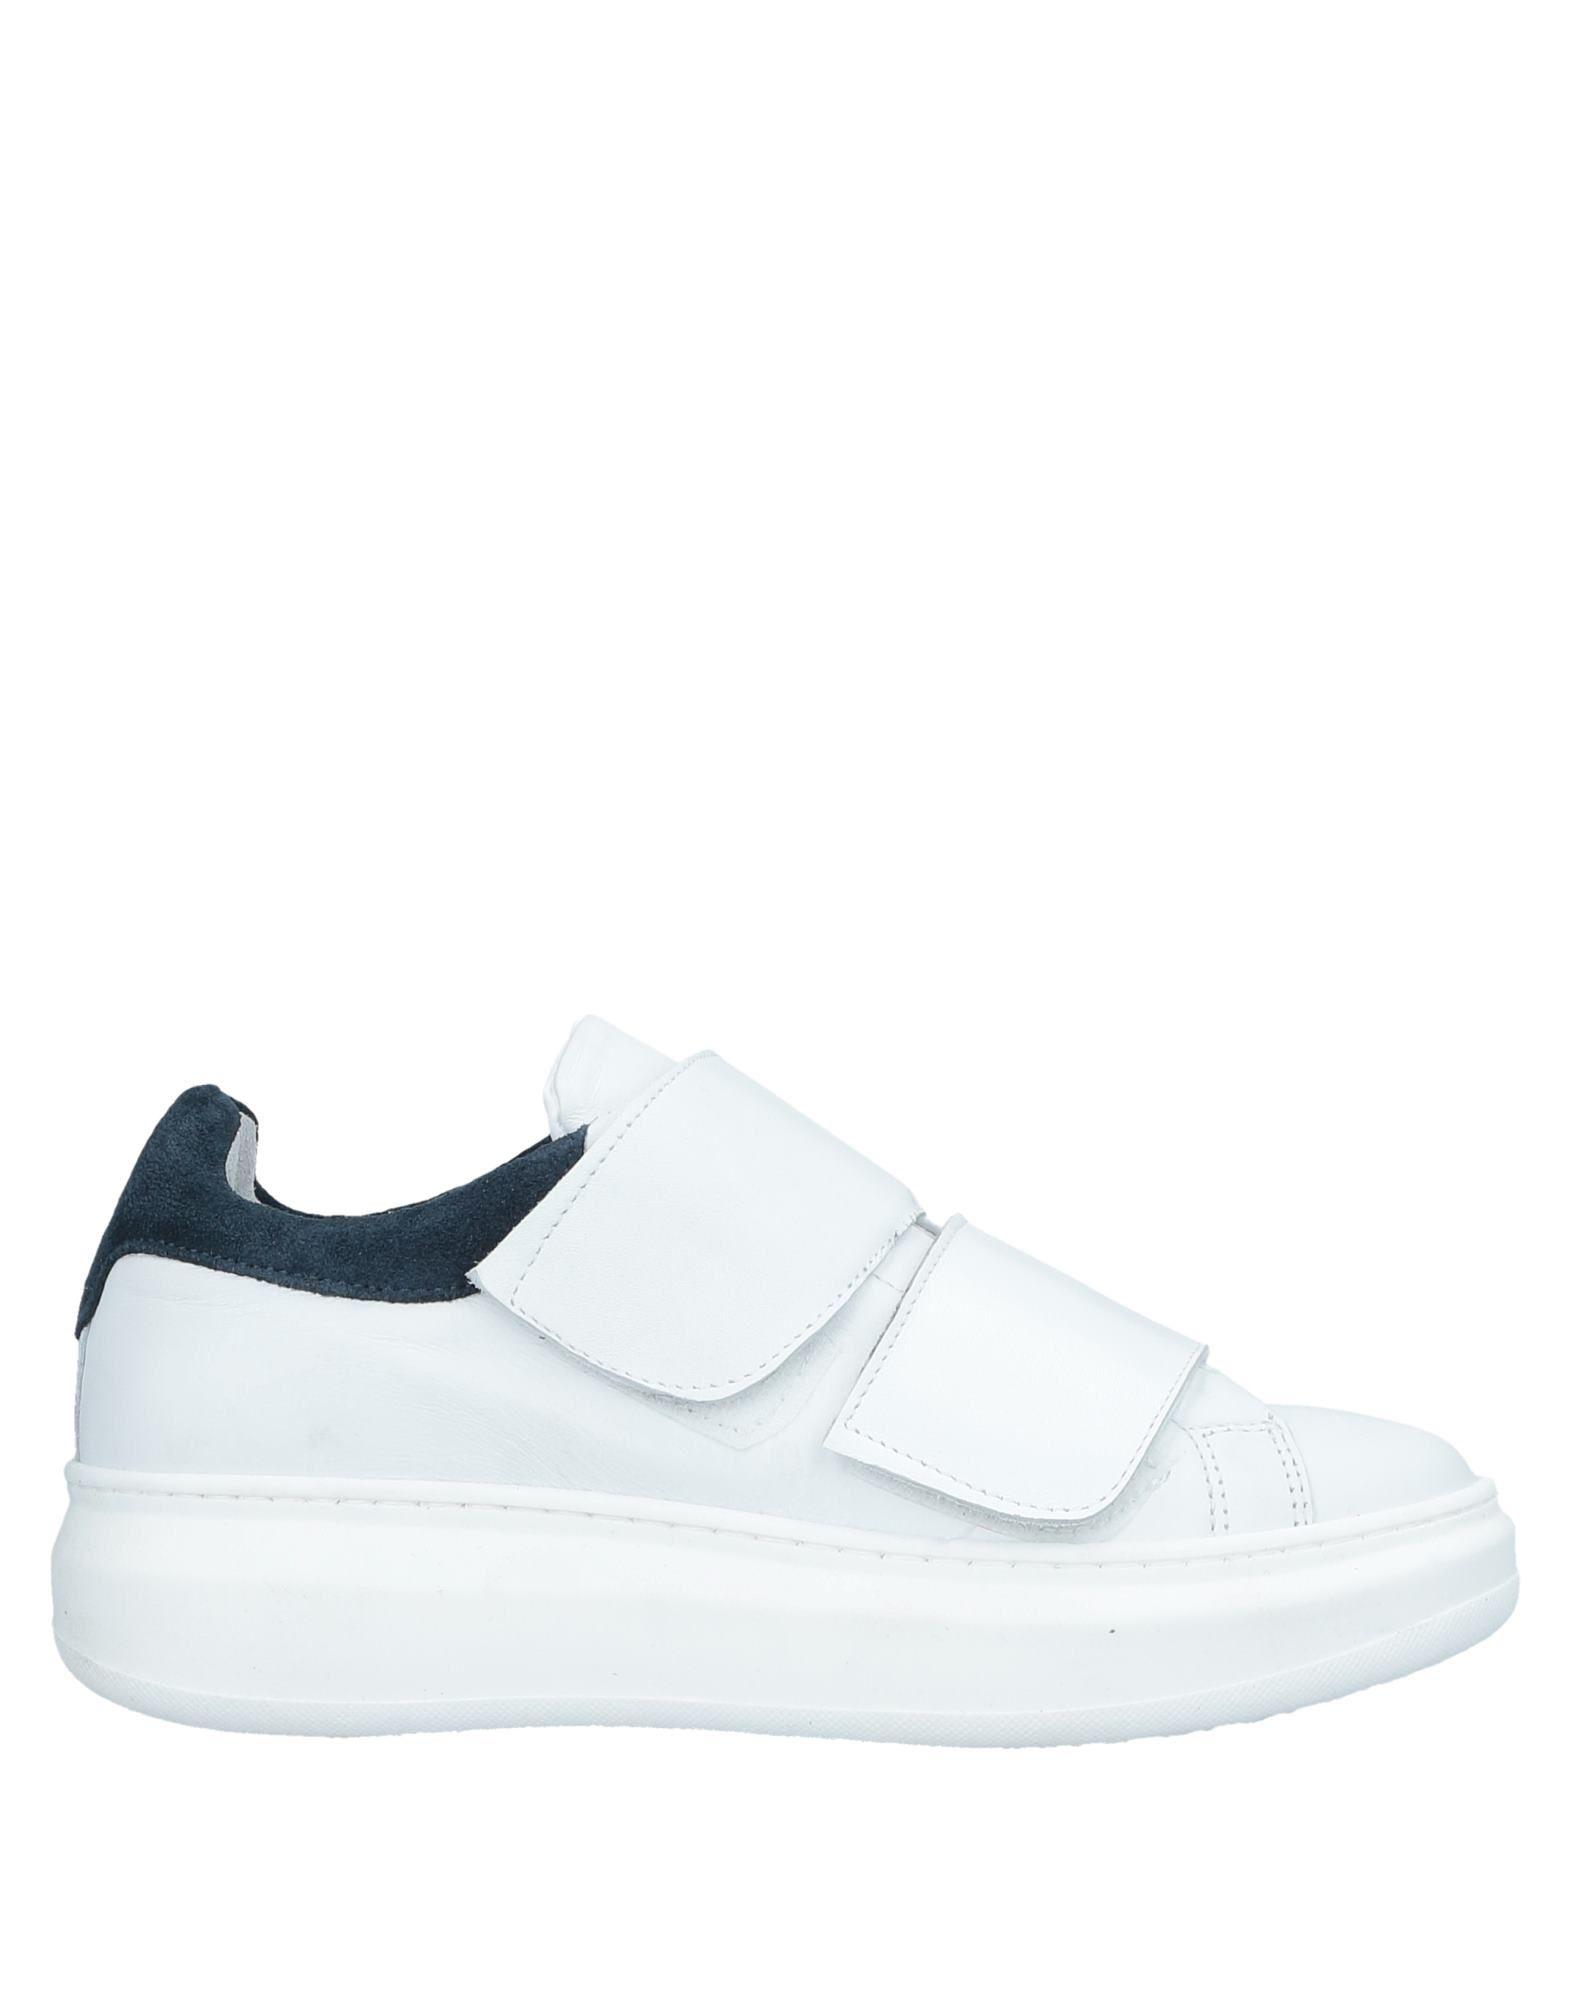 Haltbare Mode billige Schuhe Brawn's Sneakers Damen  11526882RJ Heiße Schuhe